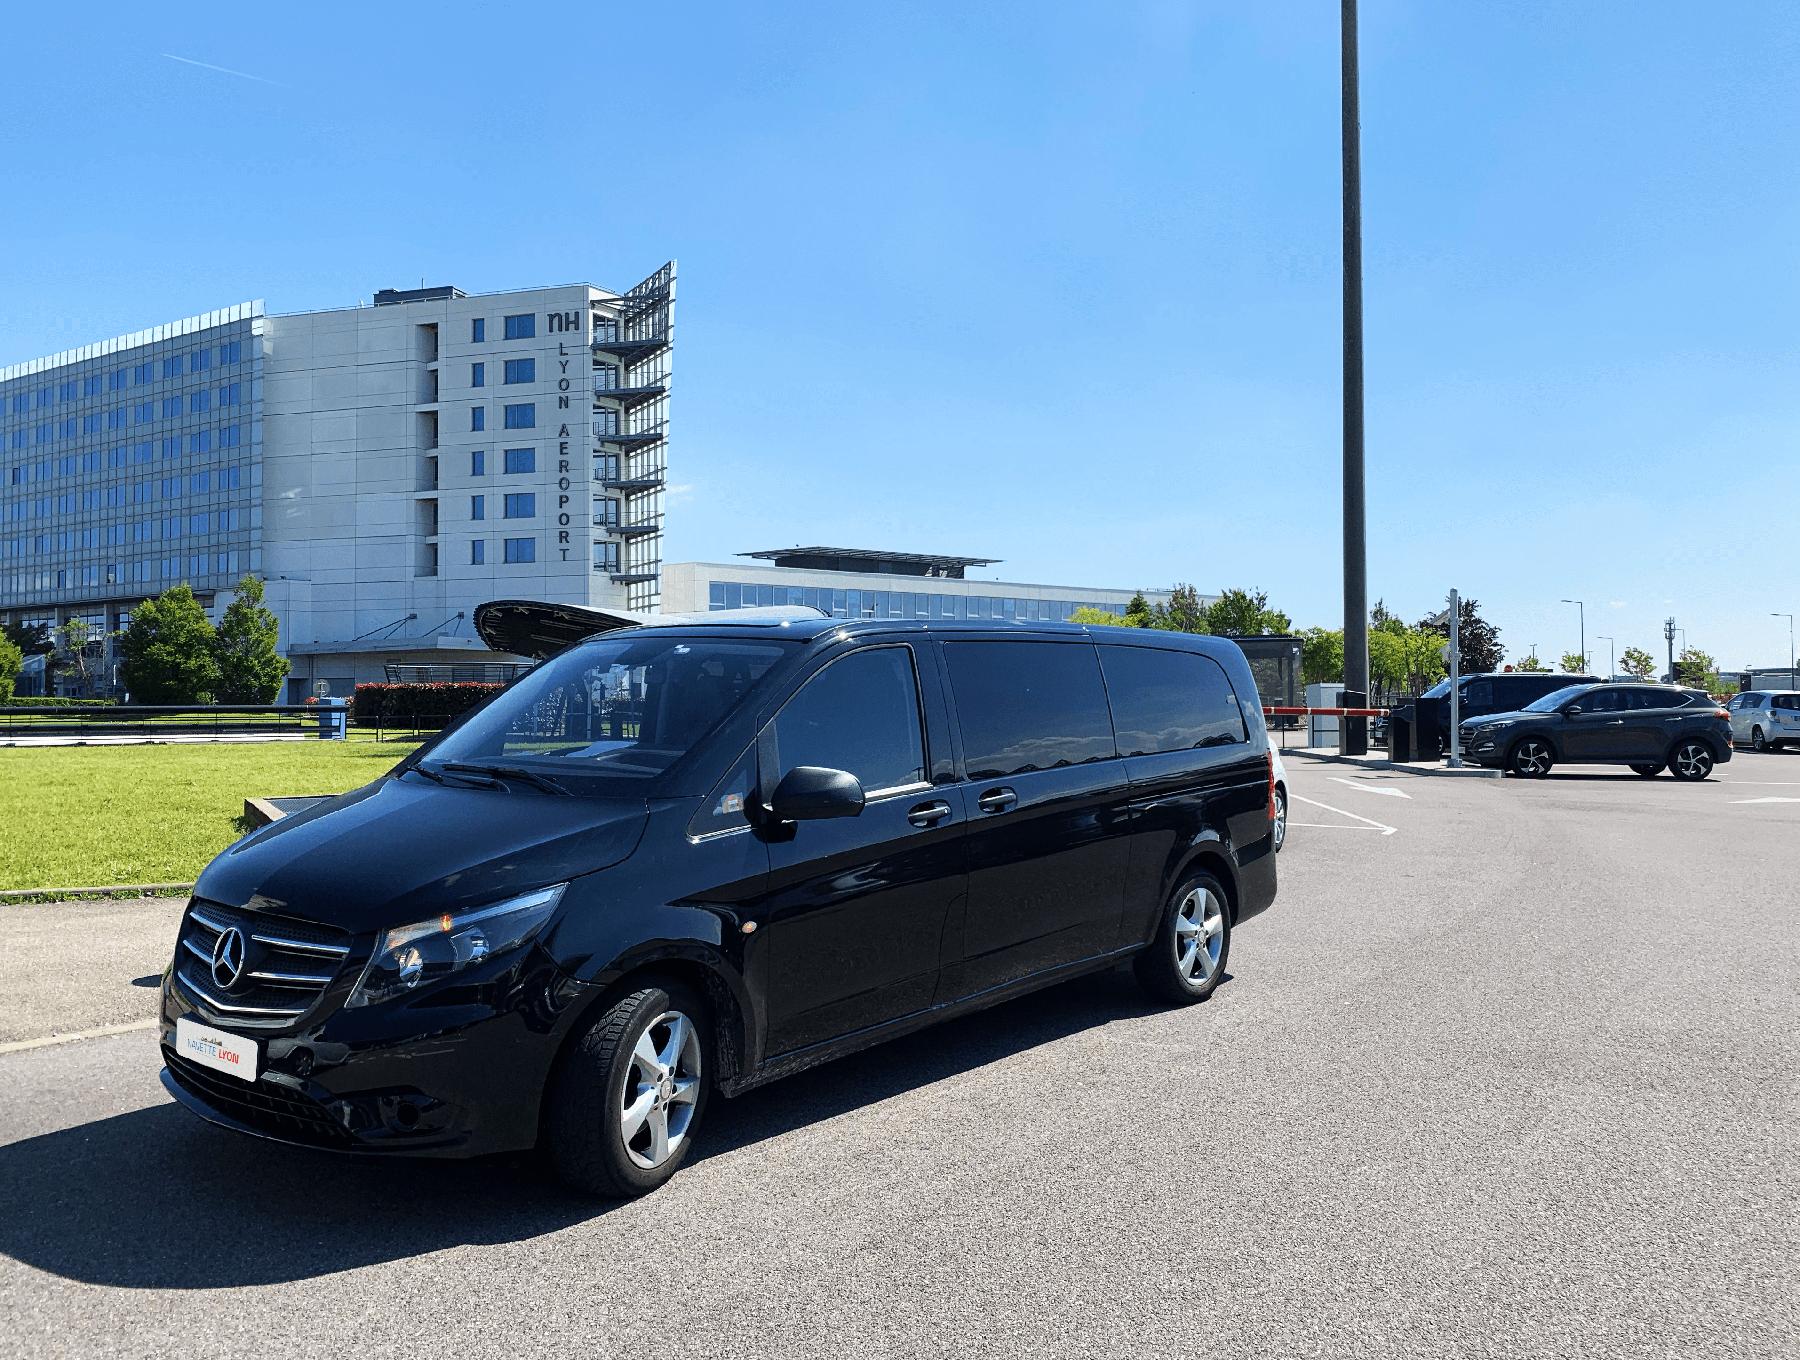 Navette Parking PR2